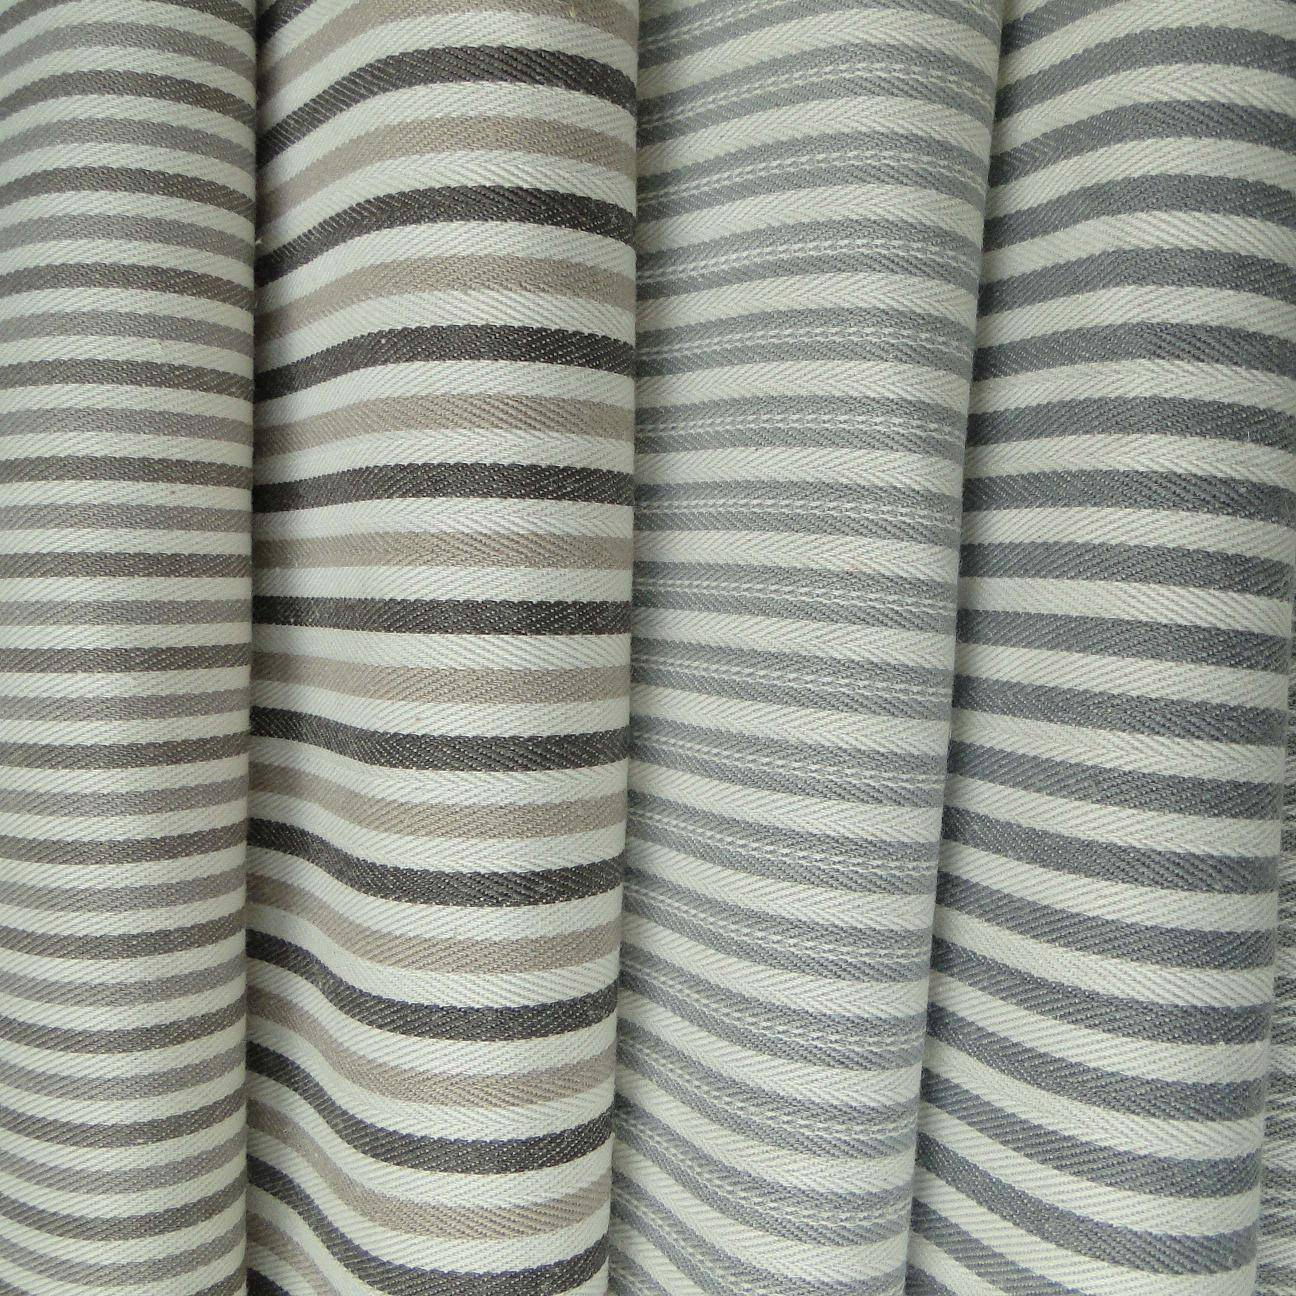 polyester/cotton woven mattress fabric